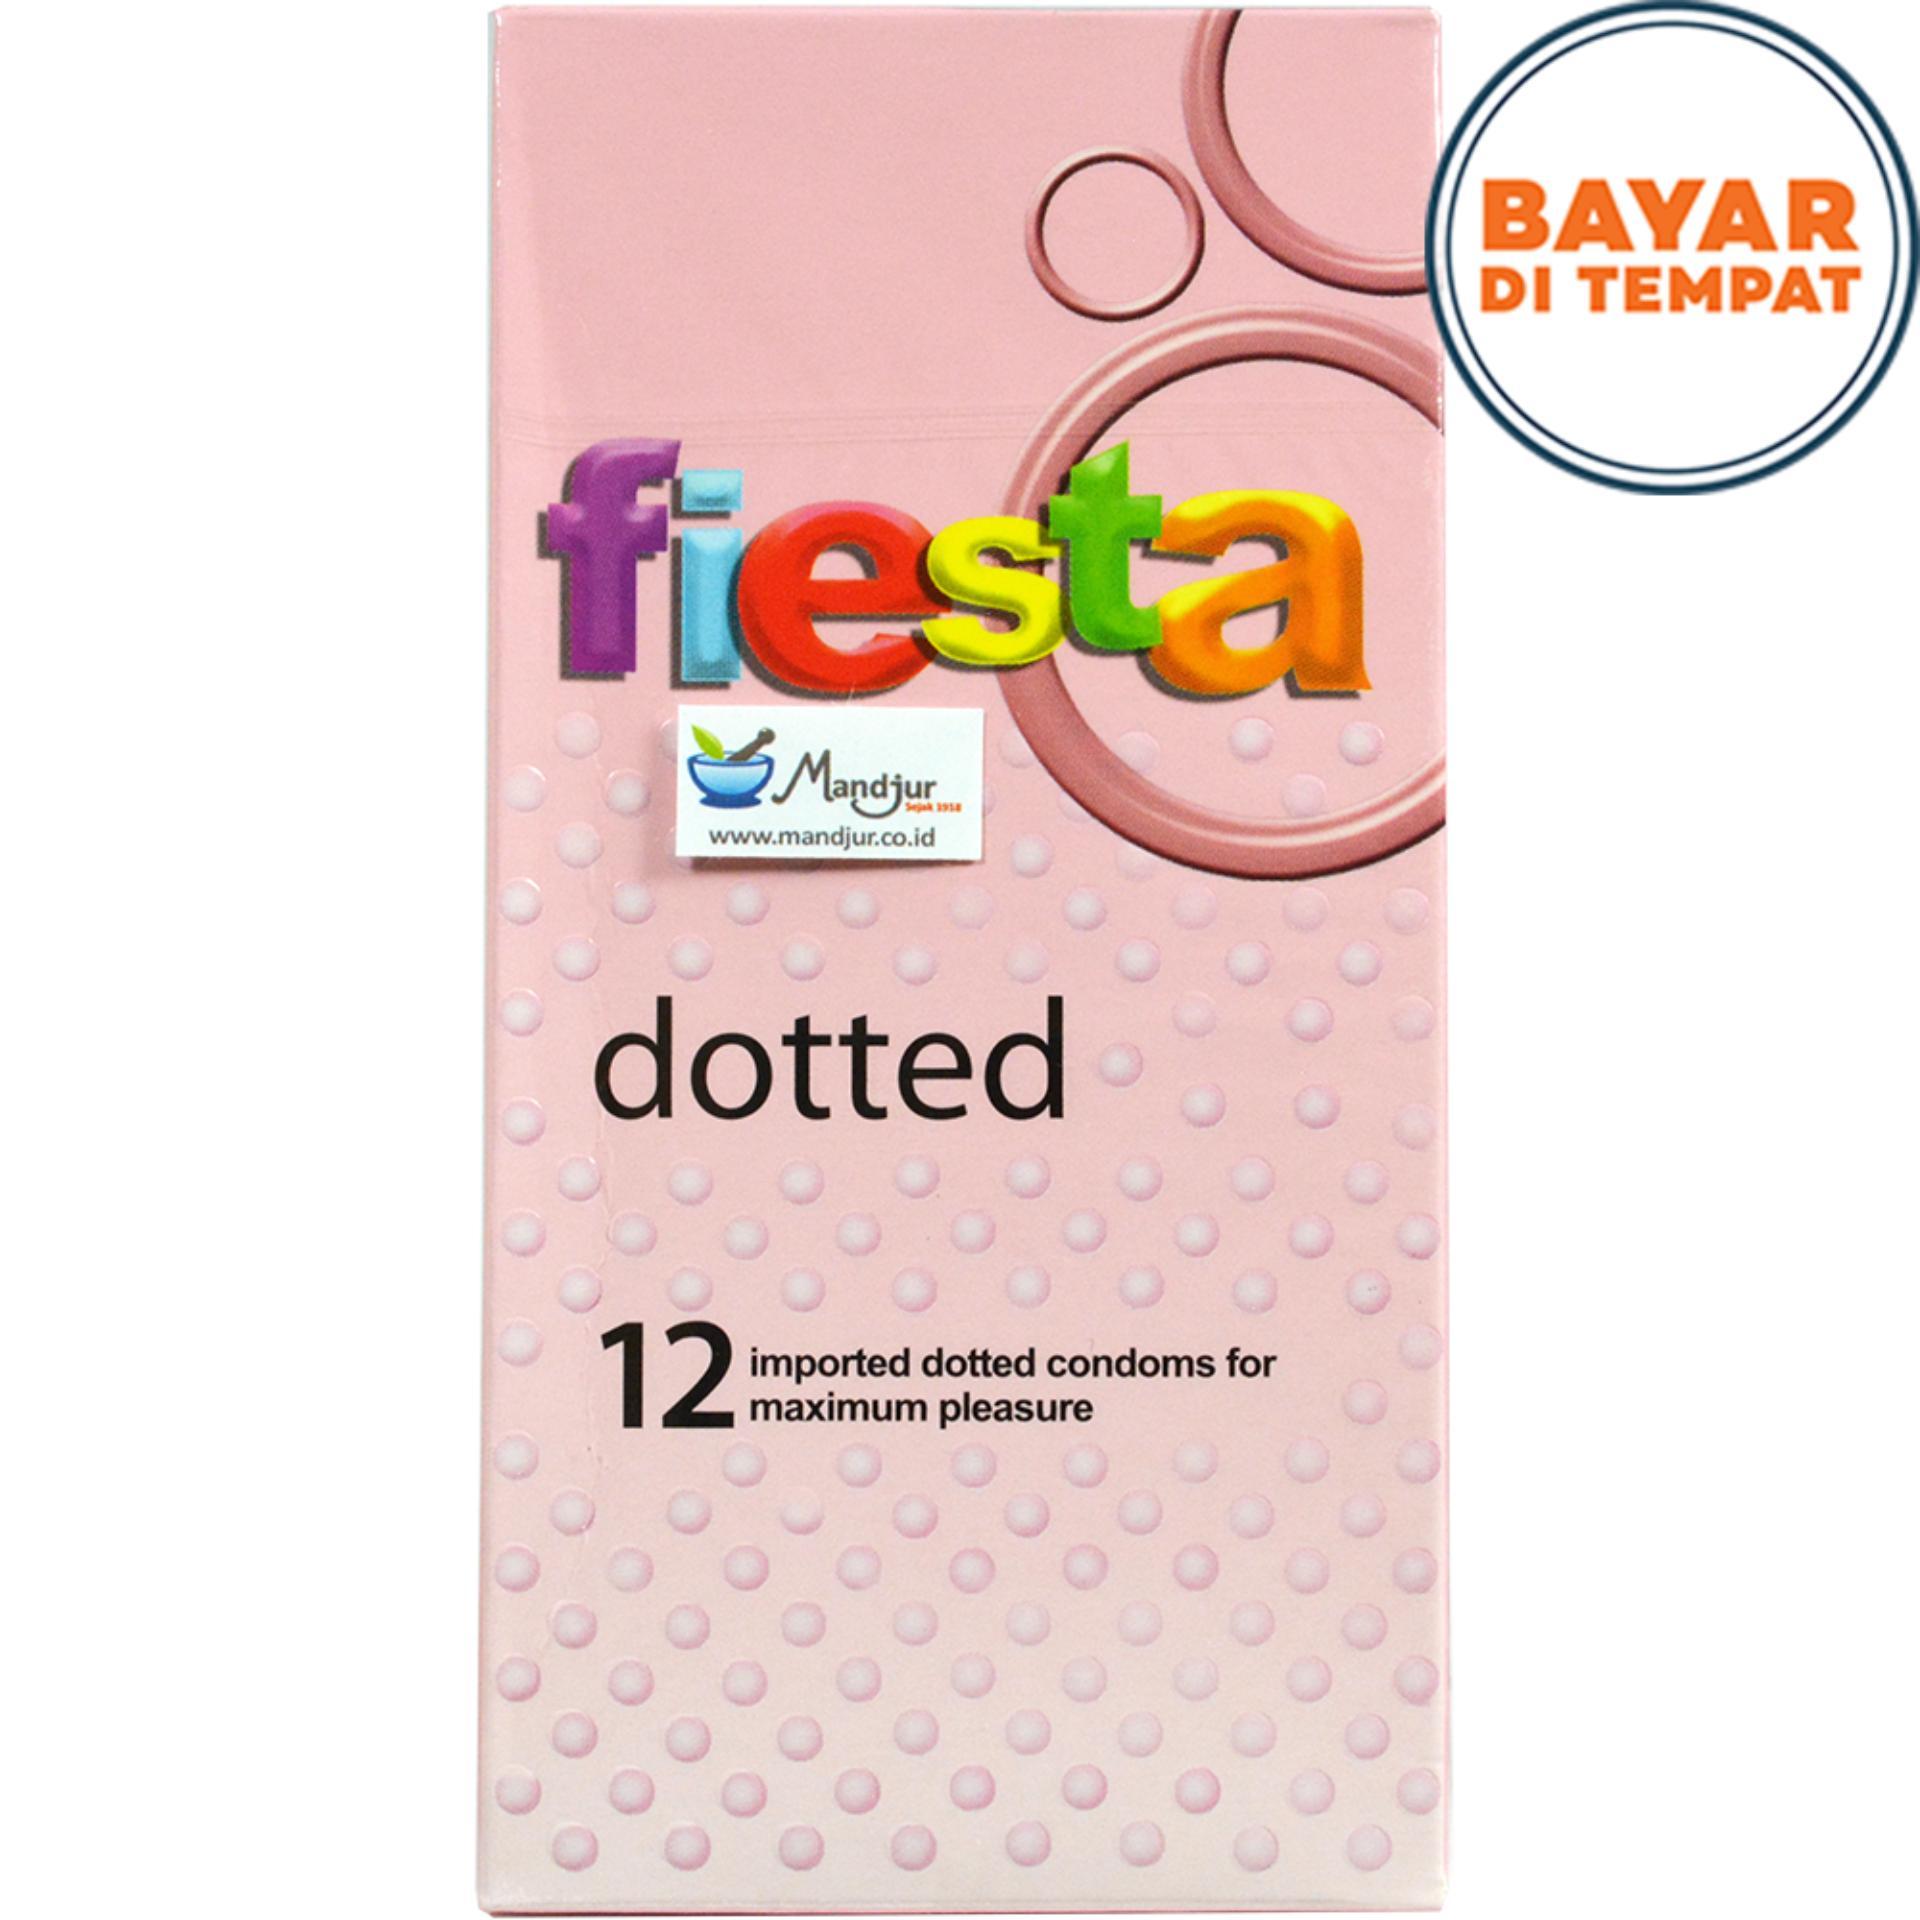 Kondom Fiesta Dotted - Isi 12